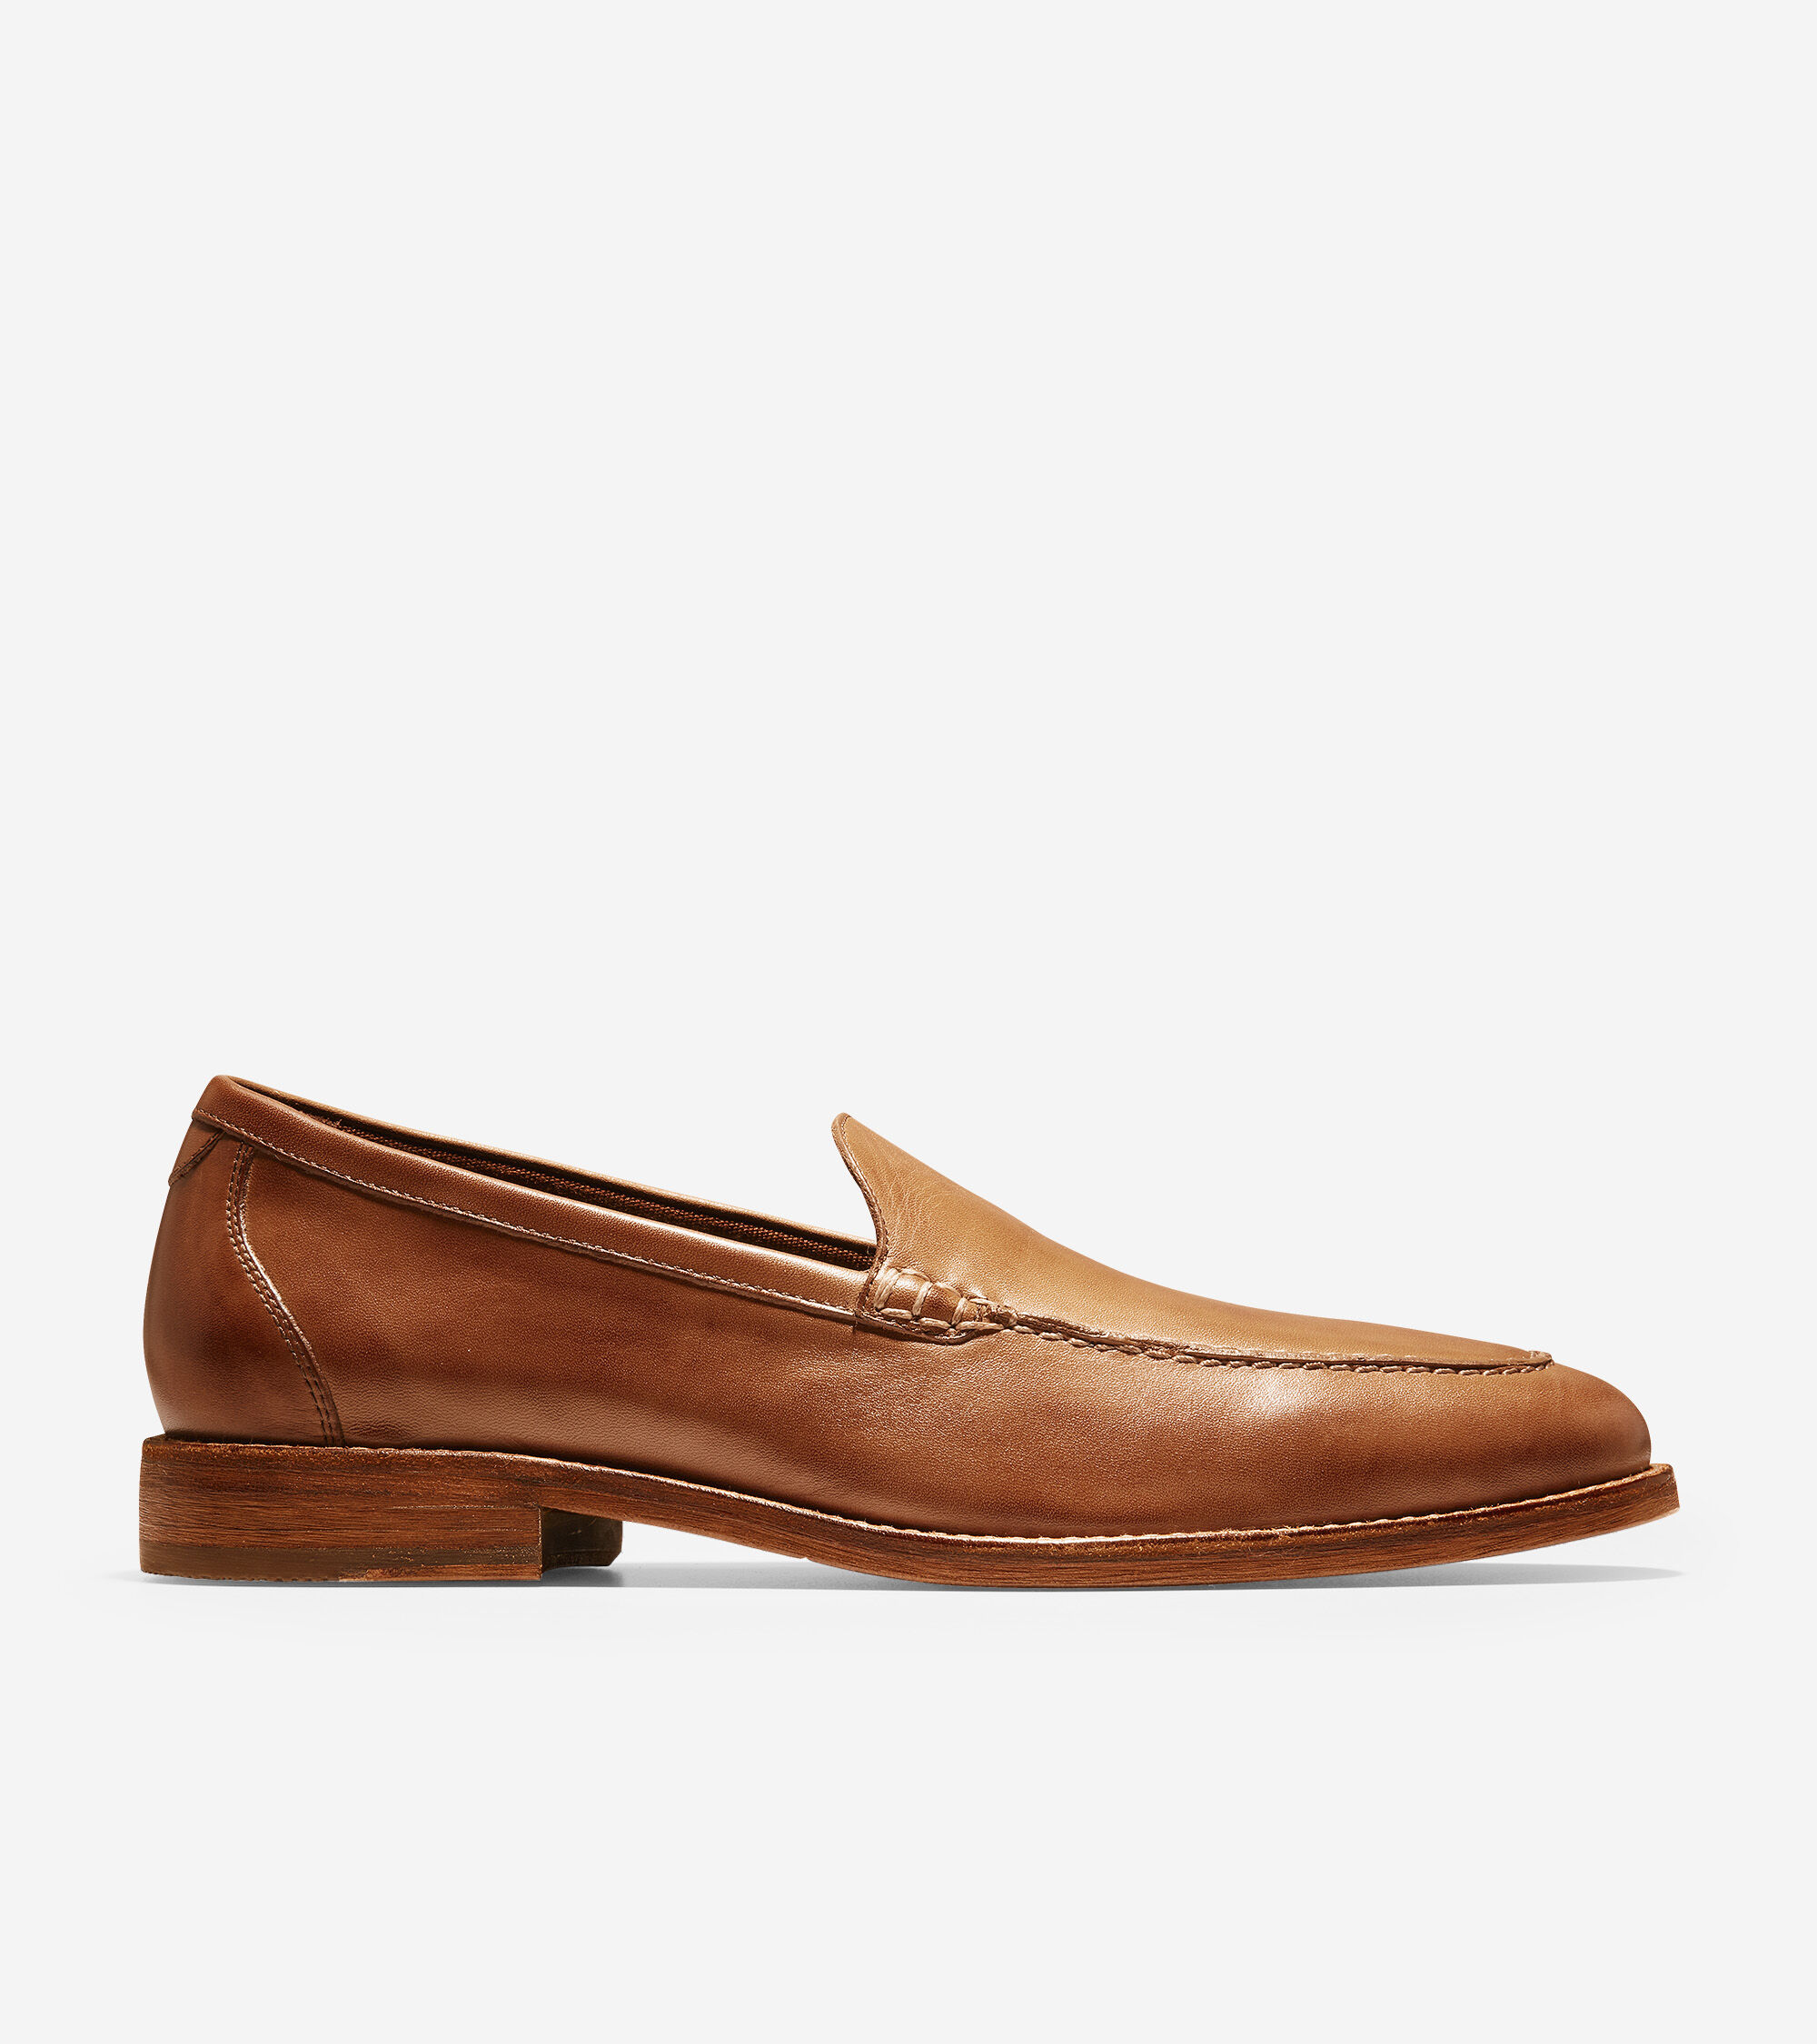 Cole Haan Men's Feathercraft Grand Venetian Loafers In British Tan